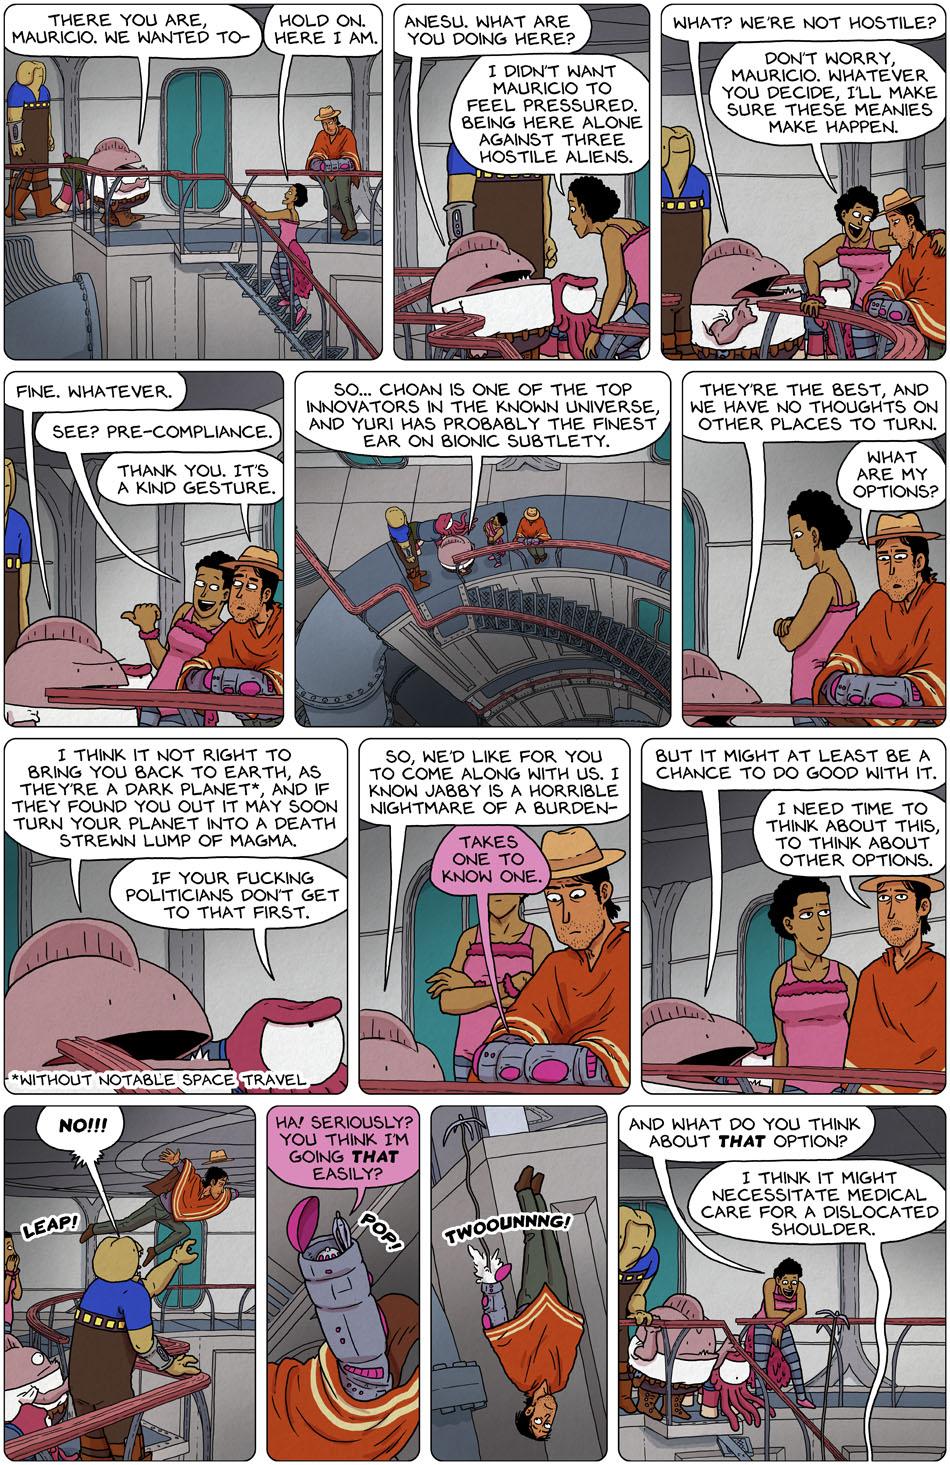 2017-02-06-spacetrawler2b